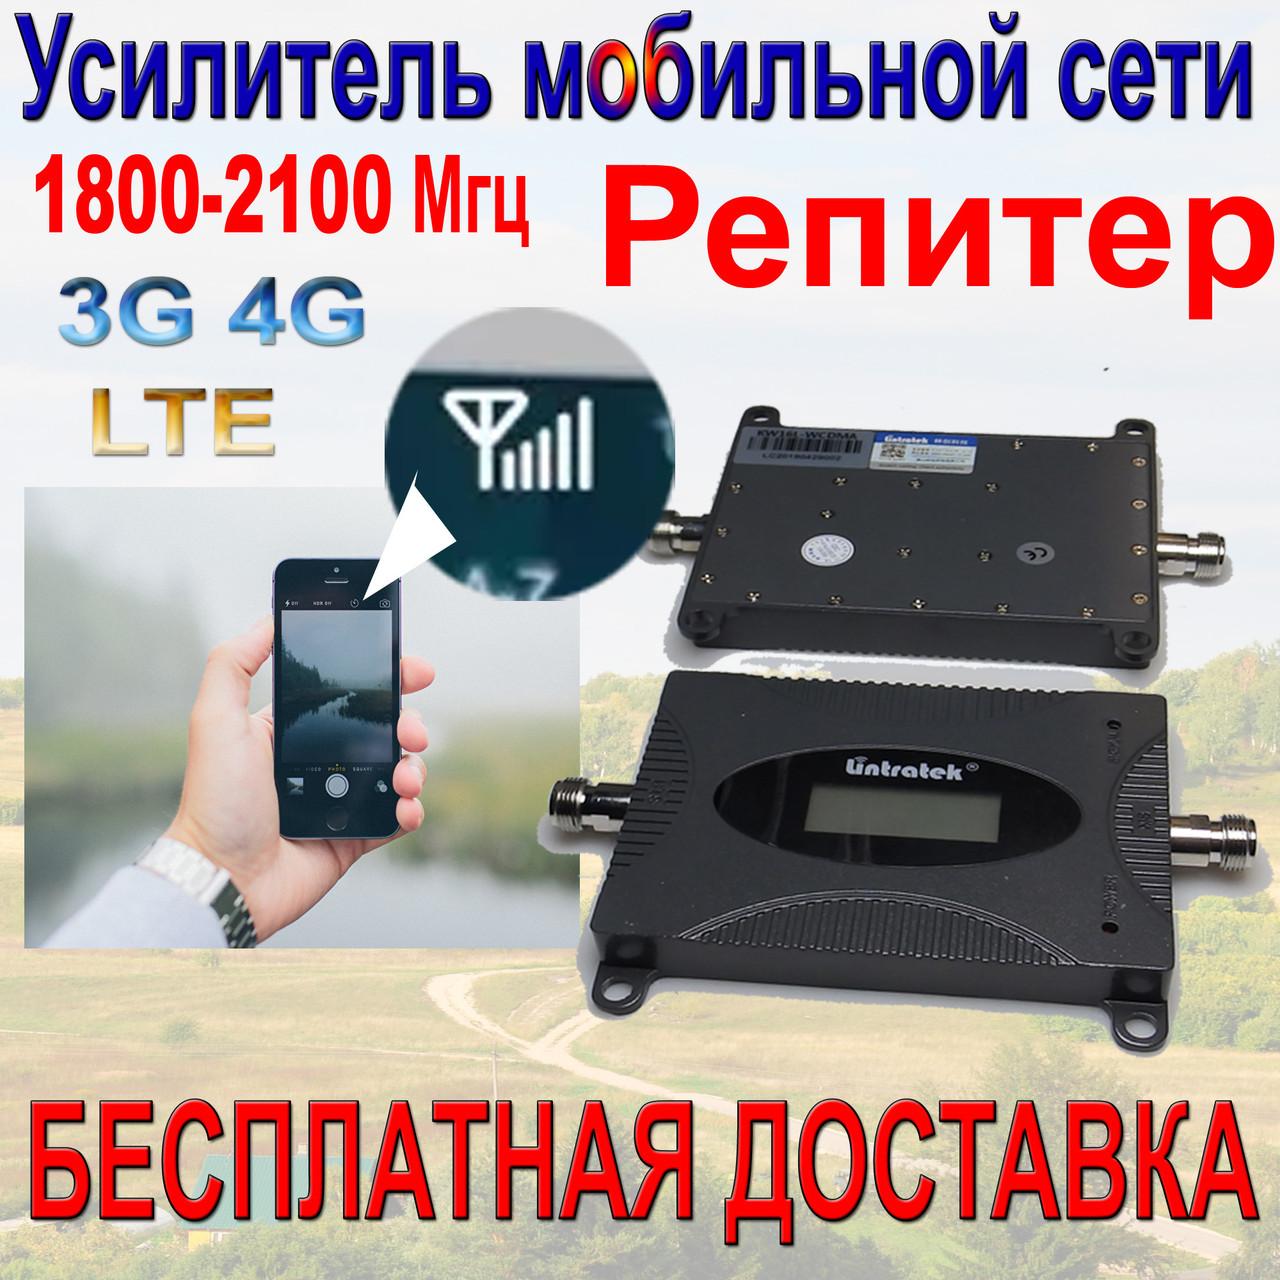 Репитер 3G 4G Lintratek KW16L Усилитель связи DCS WCDMA 1800 - 2100 Мгц +Подарок +Скидка